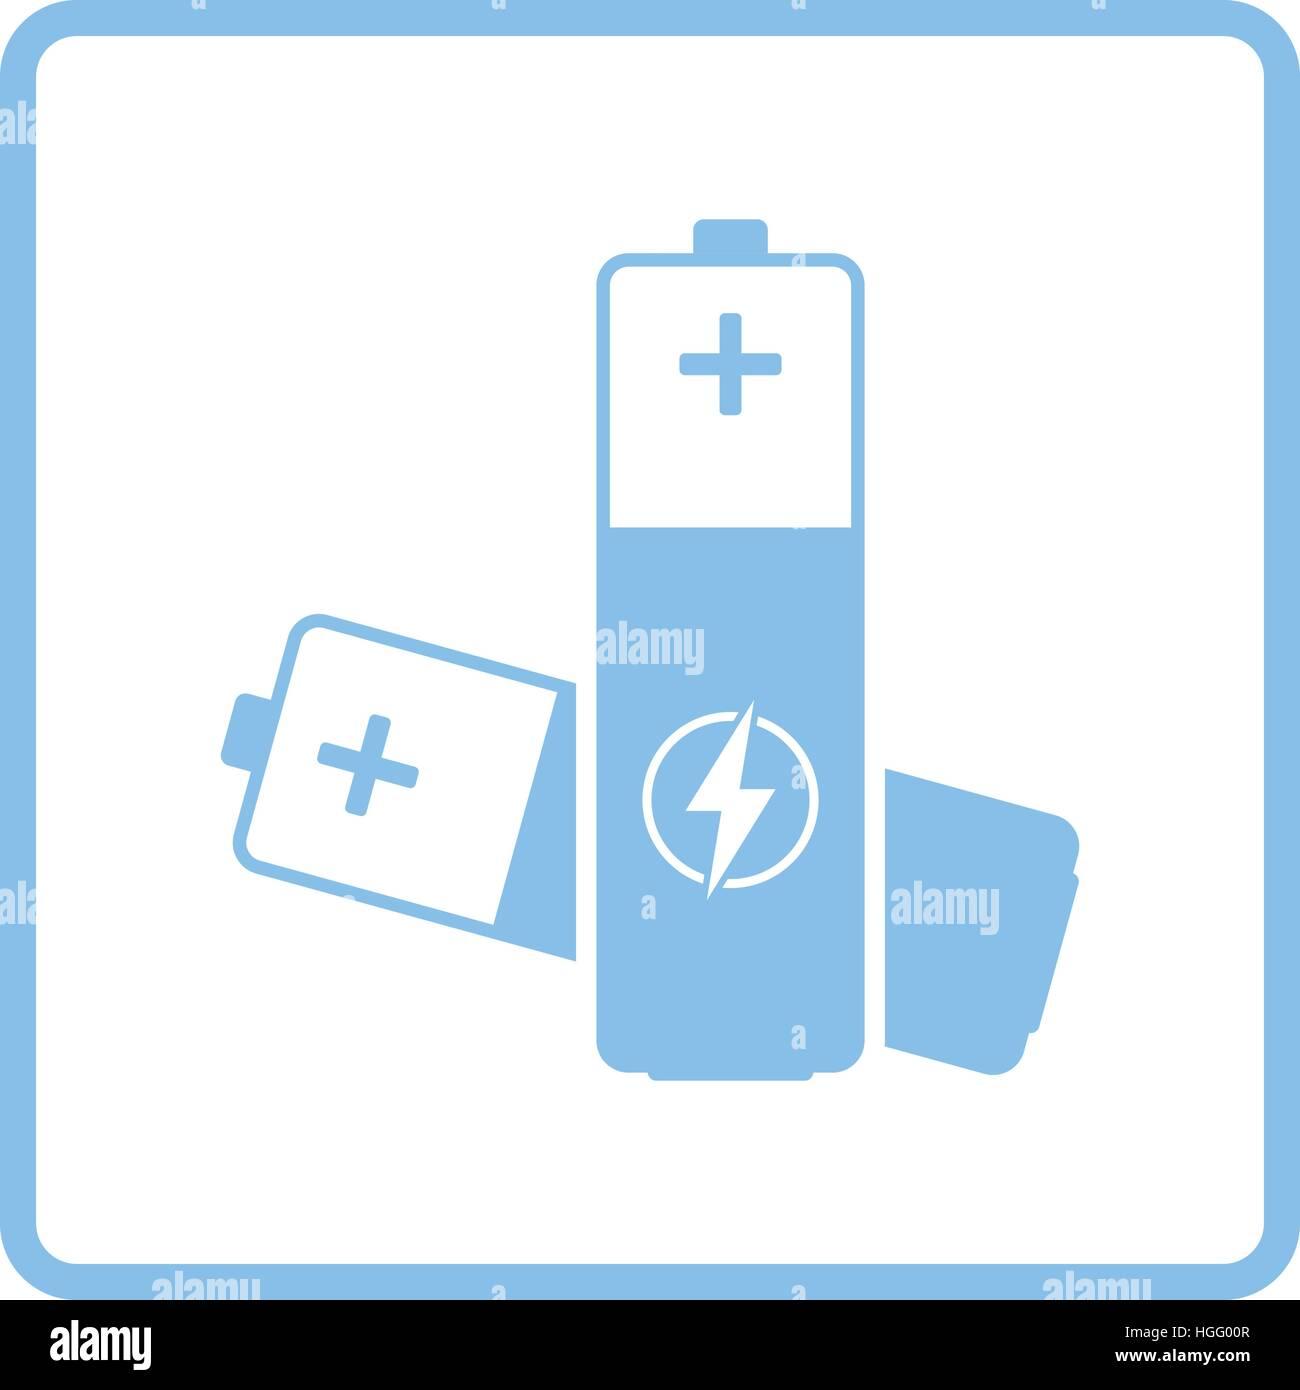 Battery Half Icon Sign Symbol Stockfotos & Battery Half Icon Sign ...